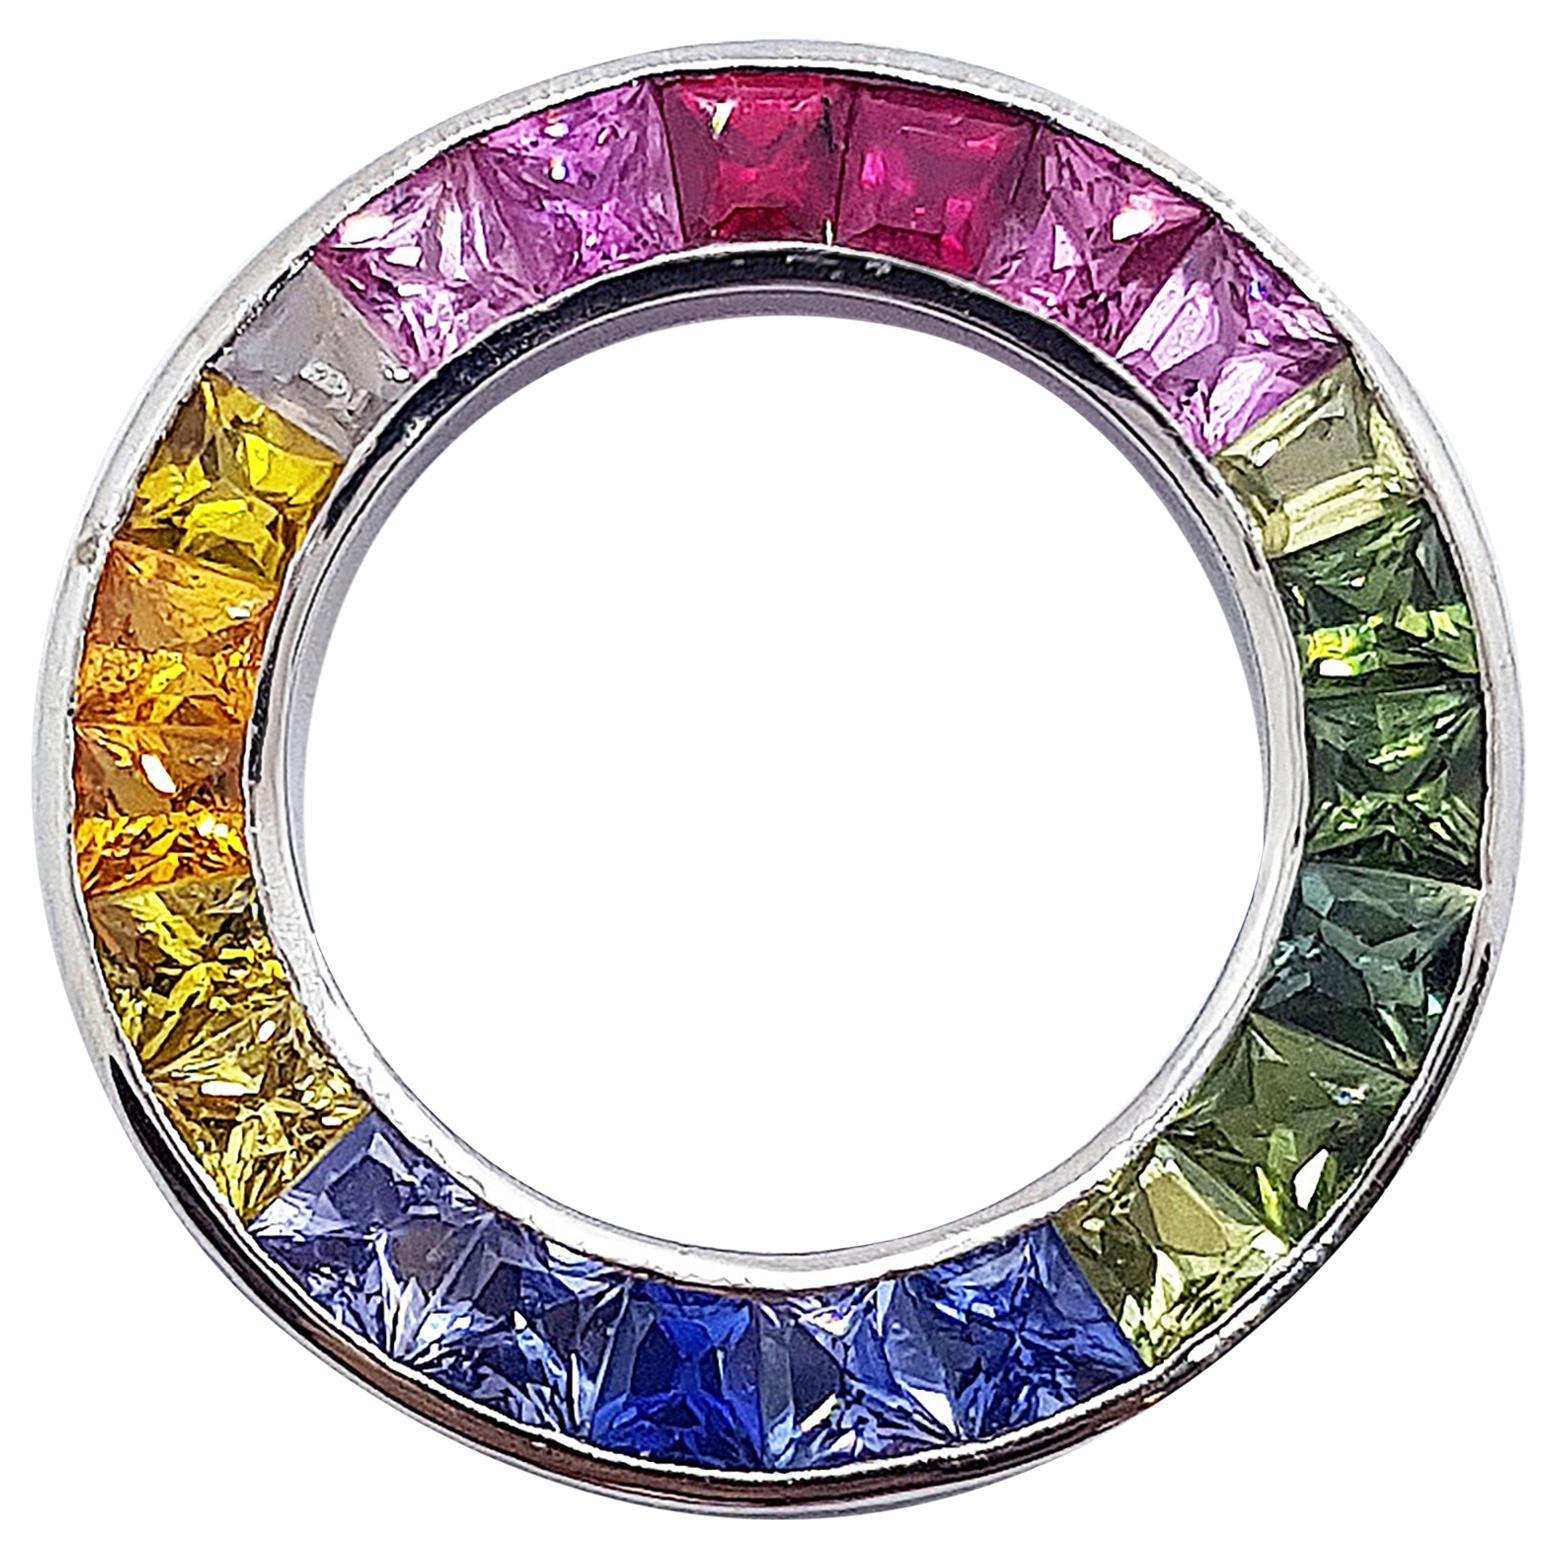 Rainbow Colour Sapphire Circle Pendant Set in 18 Karat White Gold Settings